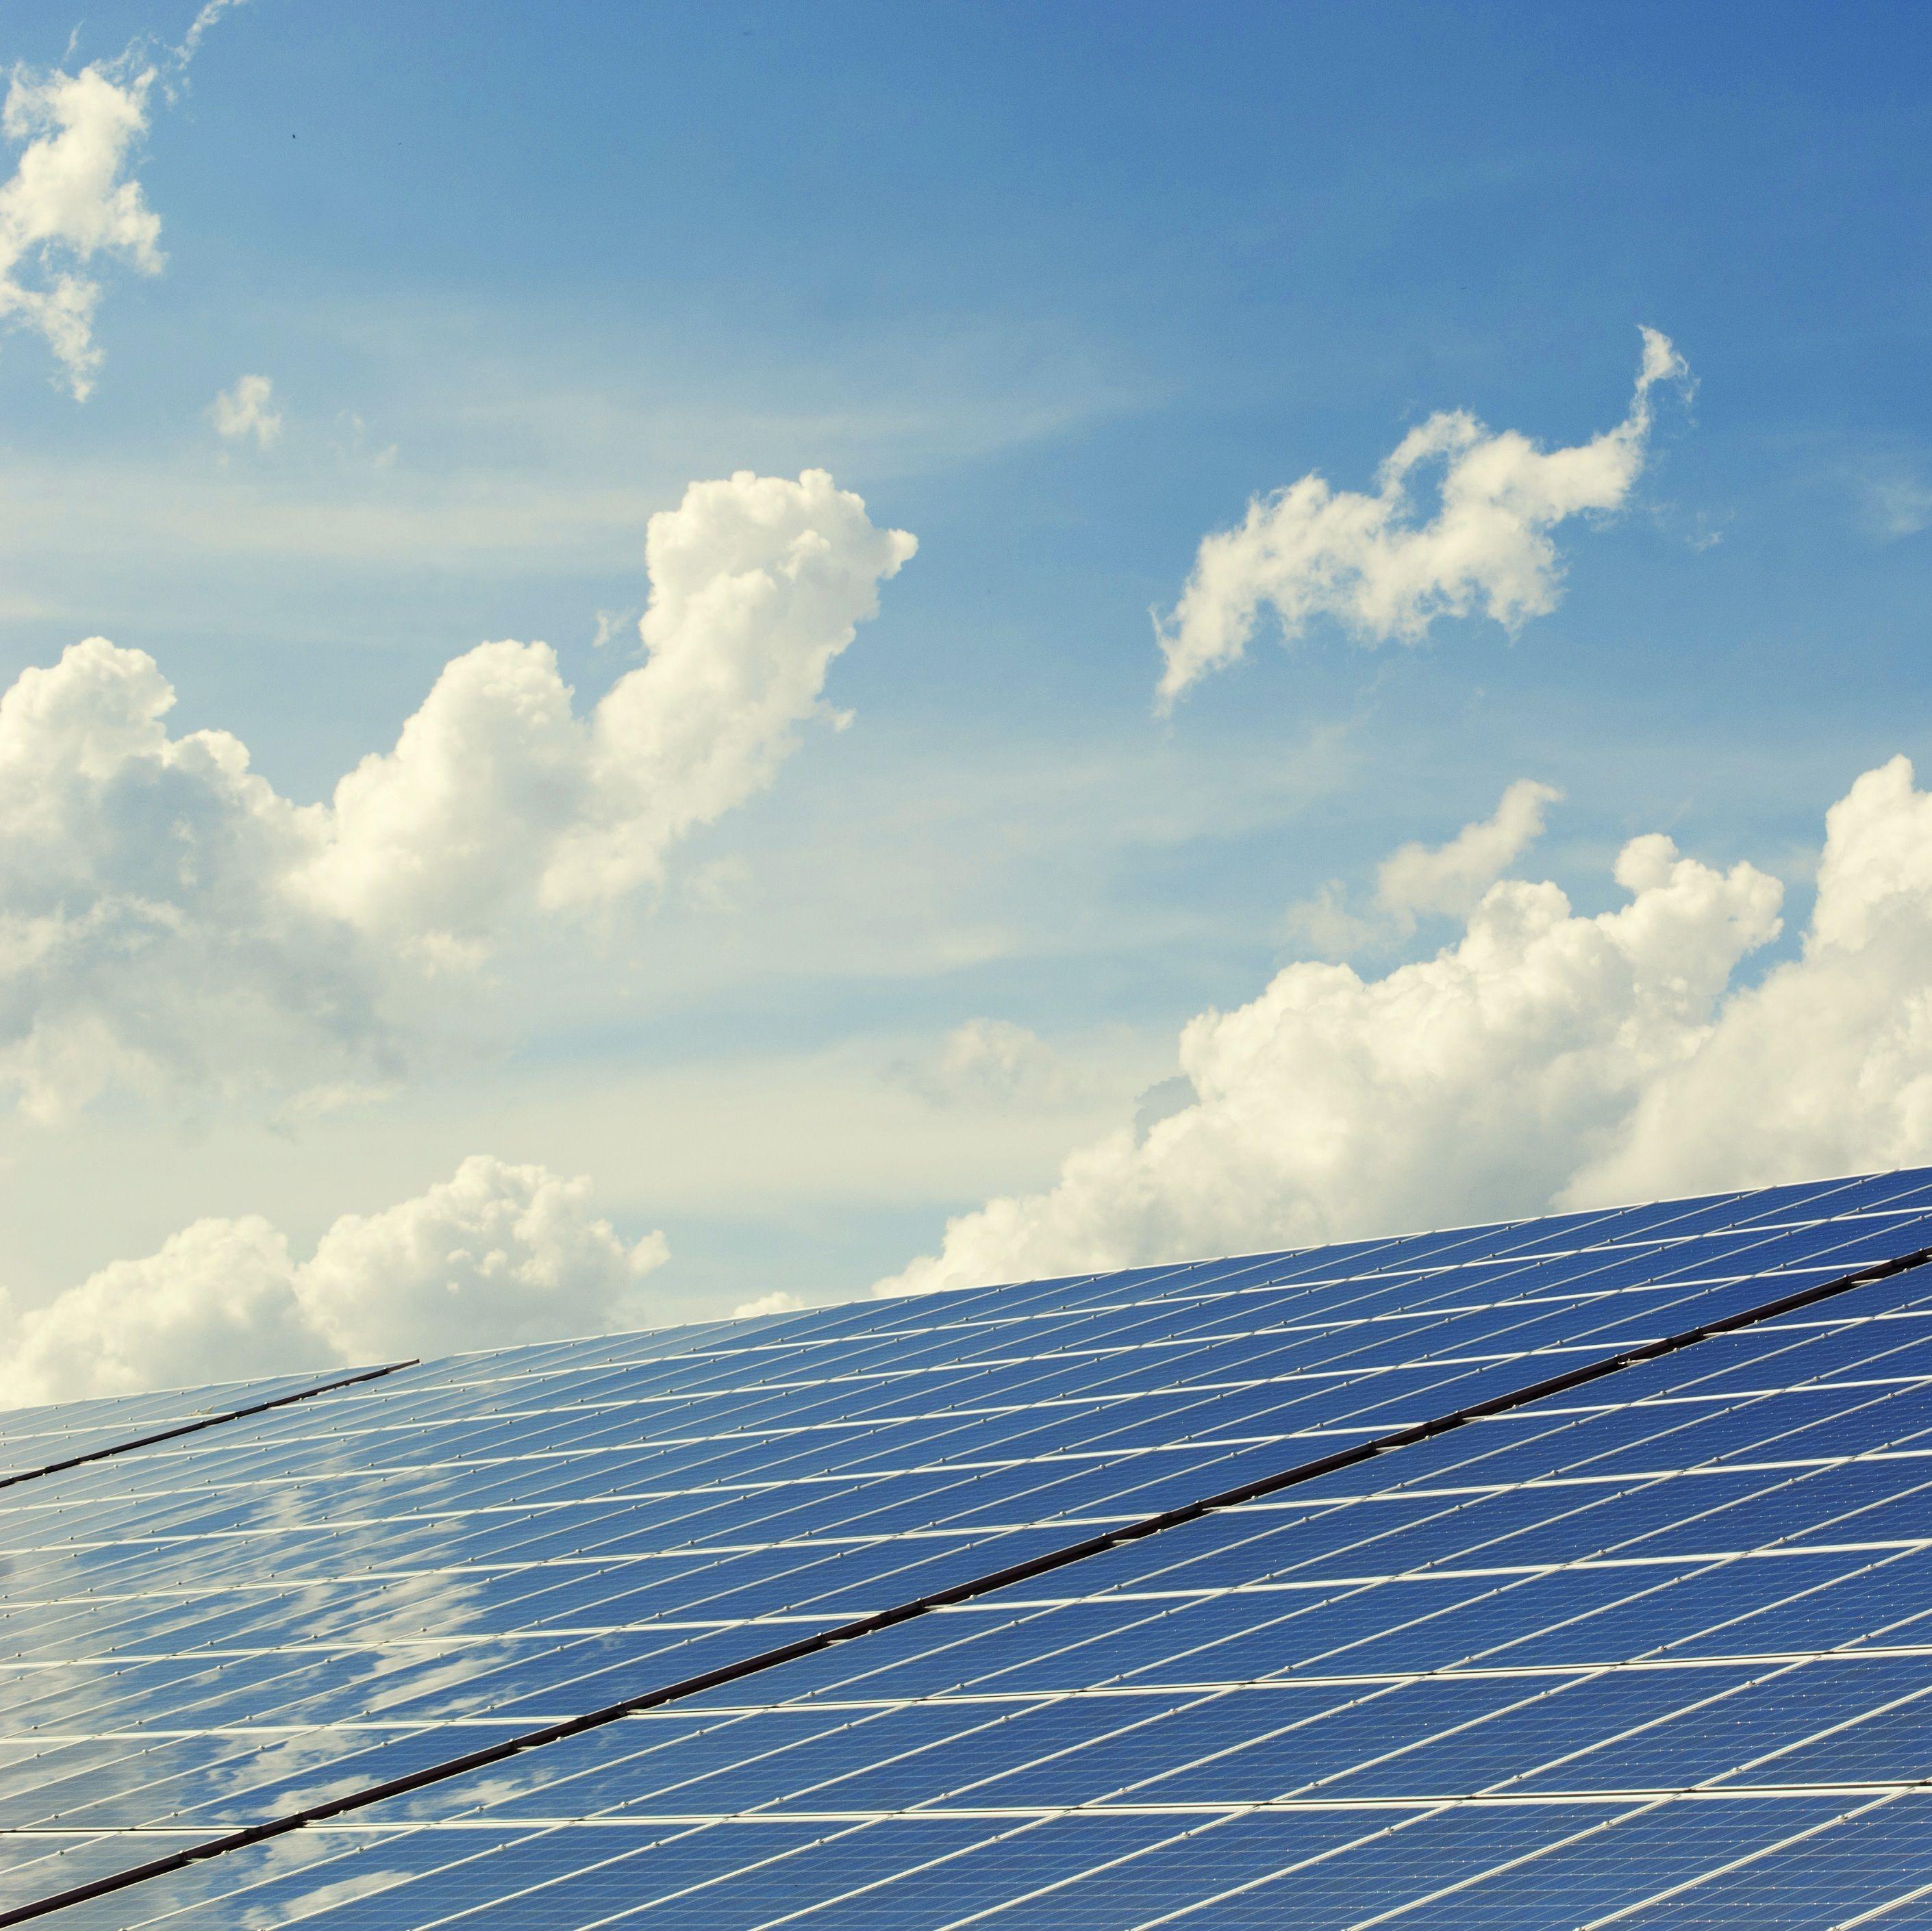 Solar panel avgslz